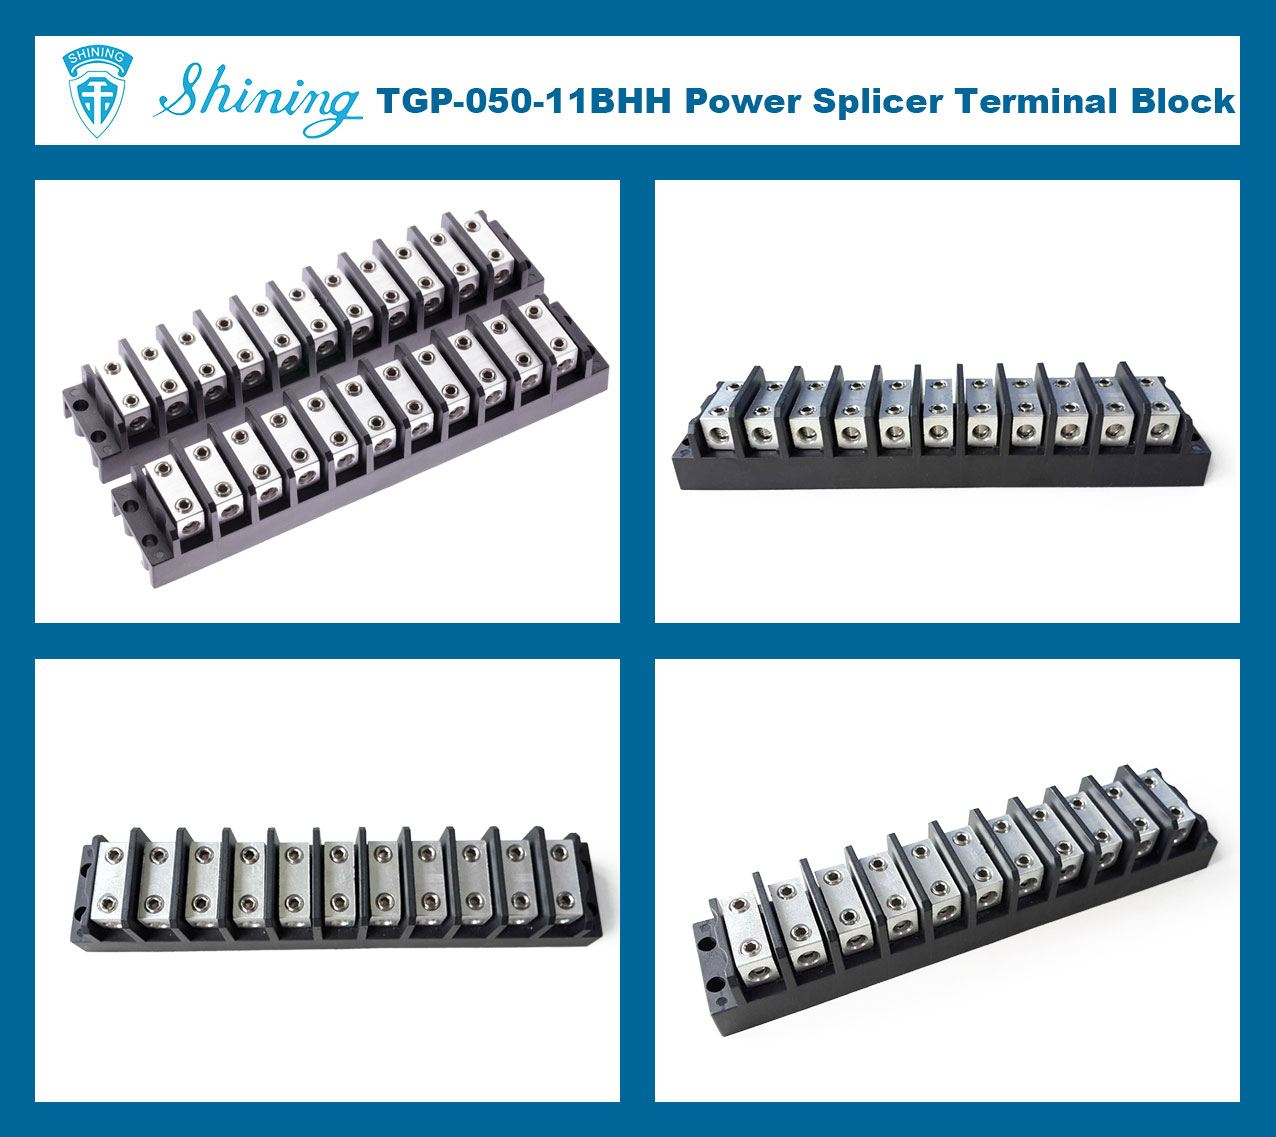 TGP-050-11BHH 600V 50A 11 Way Power Splicer Terminal Block